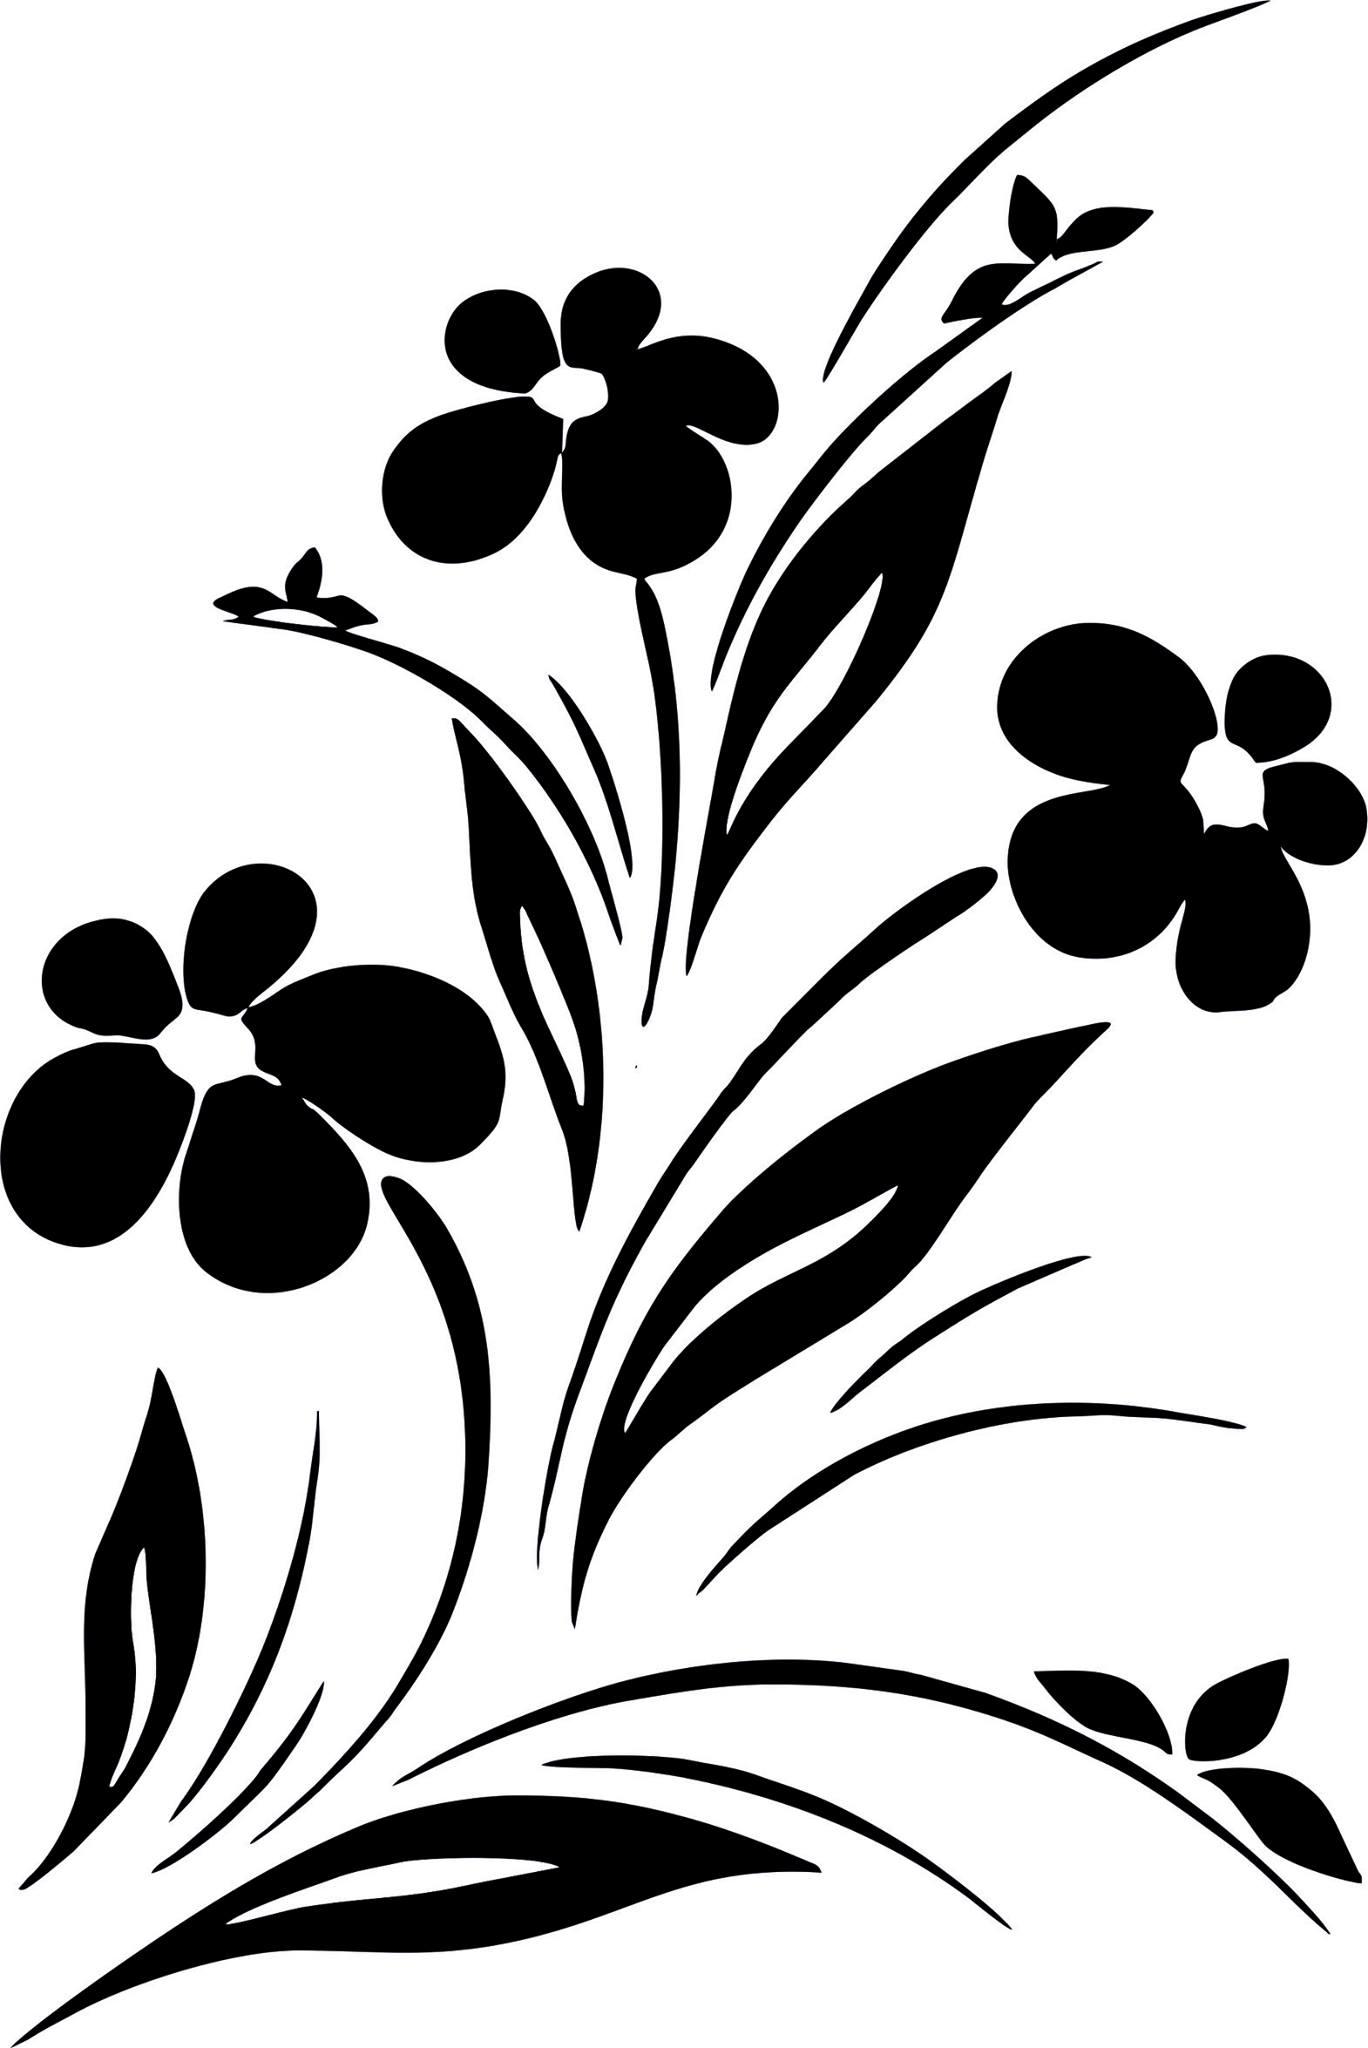 Simple Flower Designs Black And White Vector Art jpg Image.